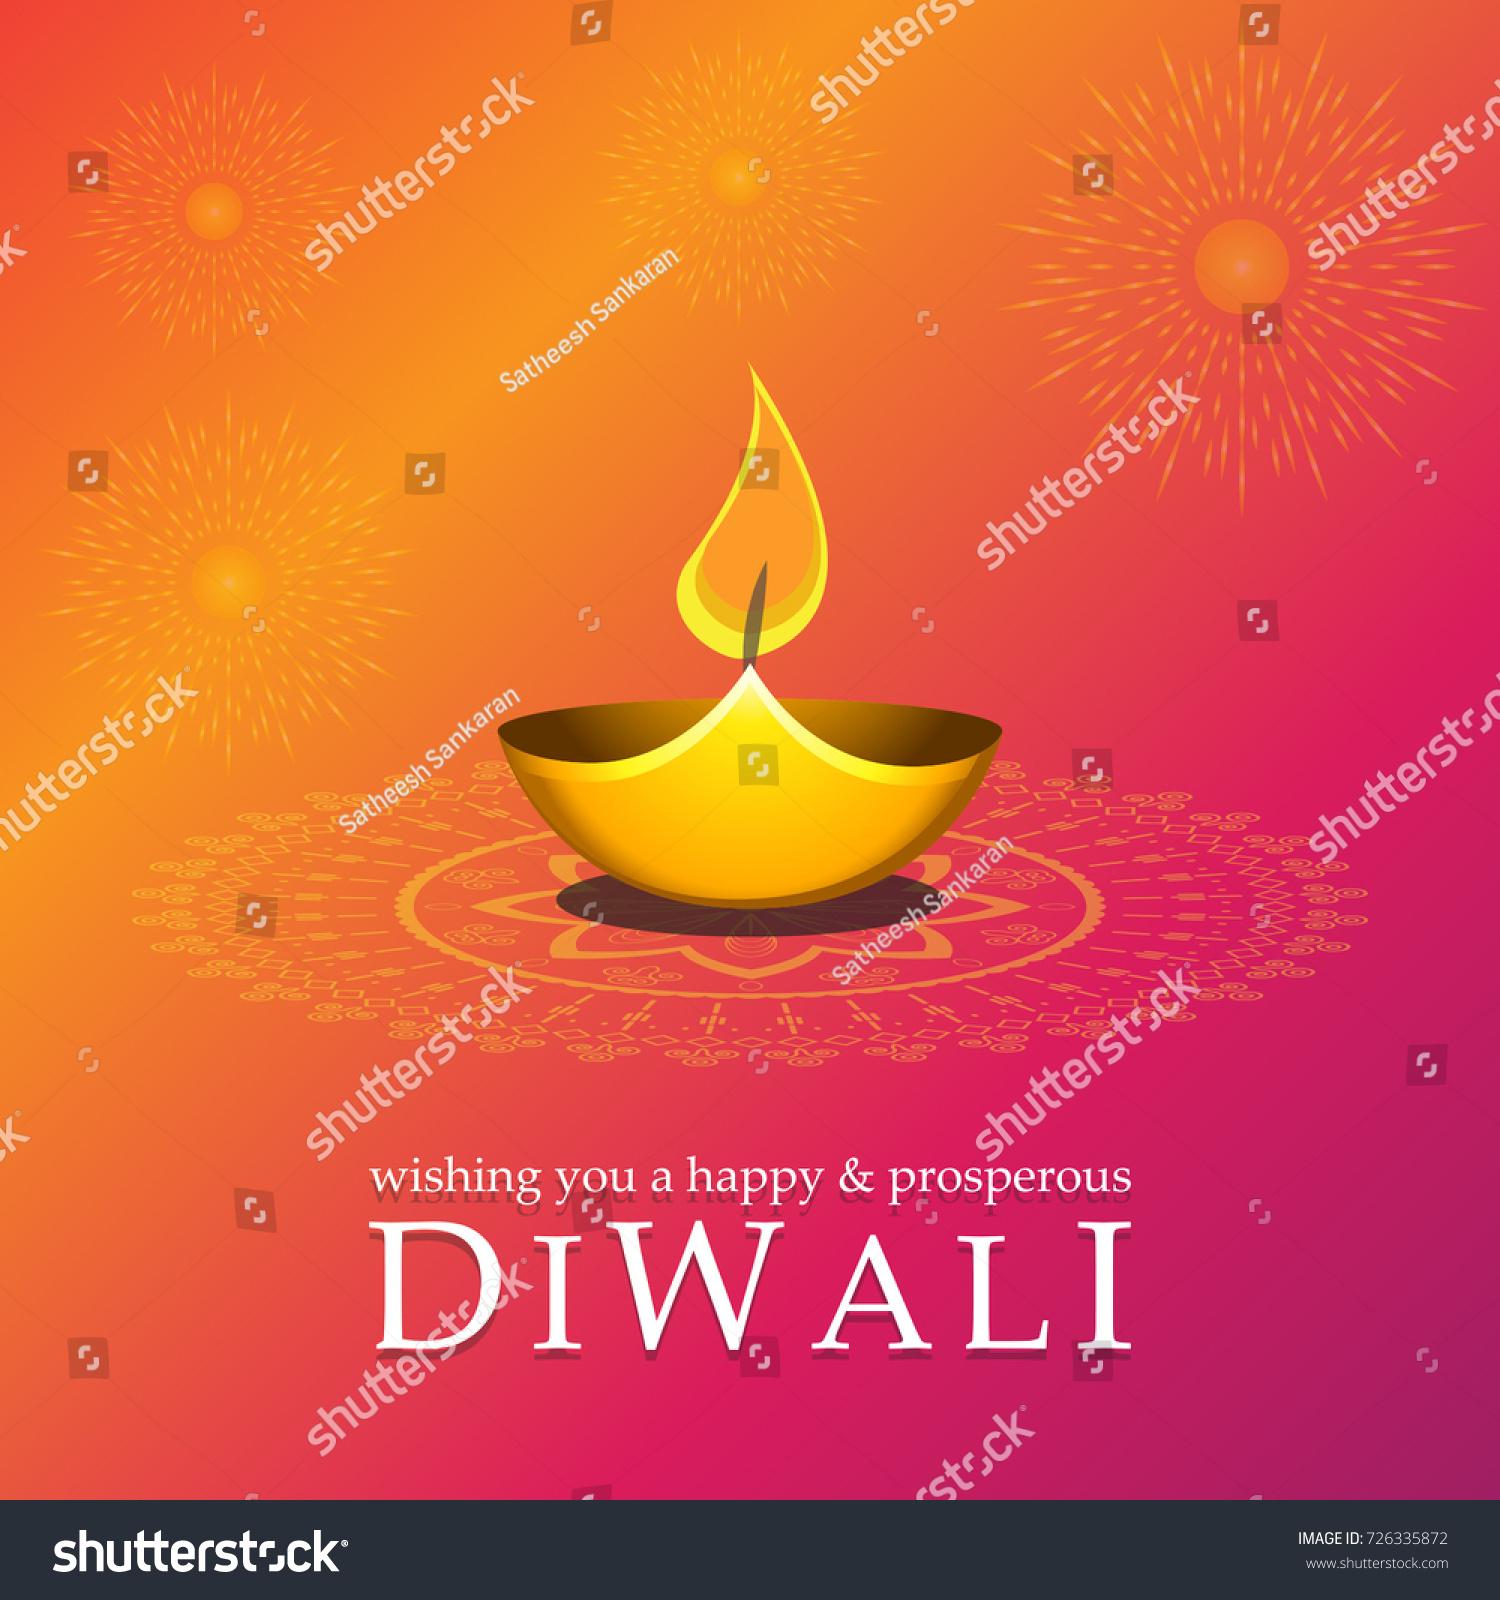 Vector Illustration Or Greeting Card For Diwali Ez Canvas